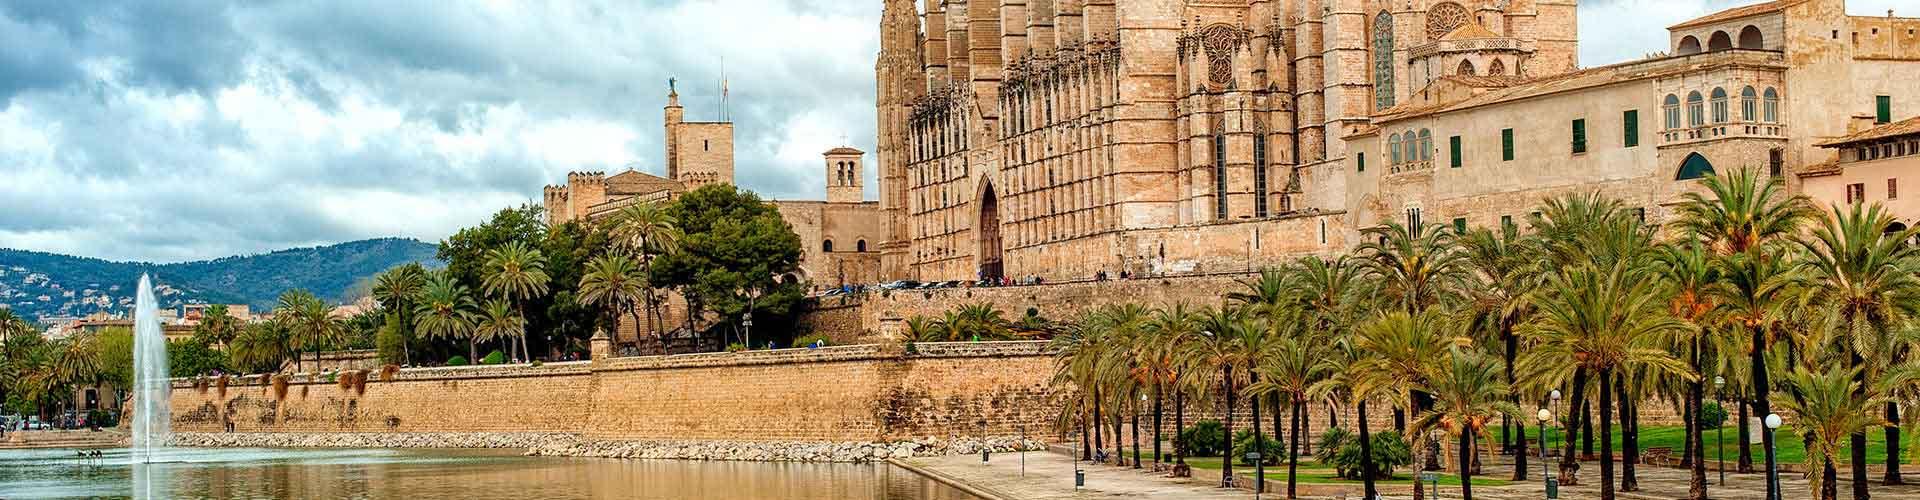 Palma de Mallorca - Hôtels à Palma de Mallorca. Cartes pour Palma de Mallorca, photos et commentaires pour chaque hôtel à Palma de Mallorca.